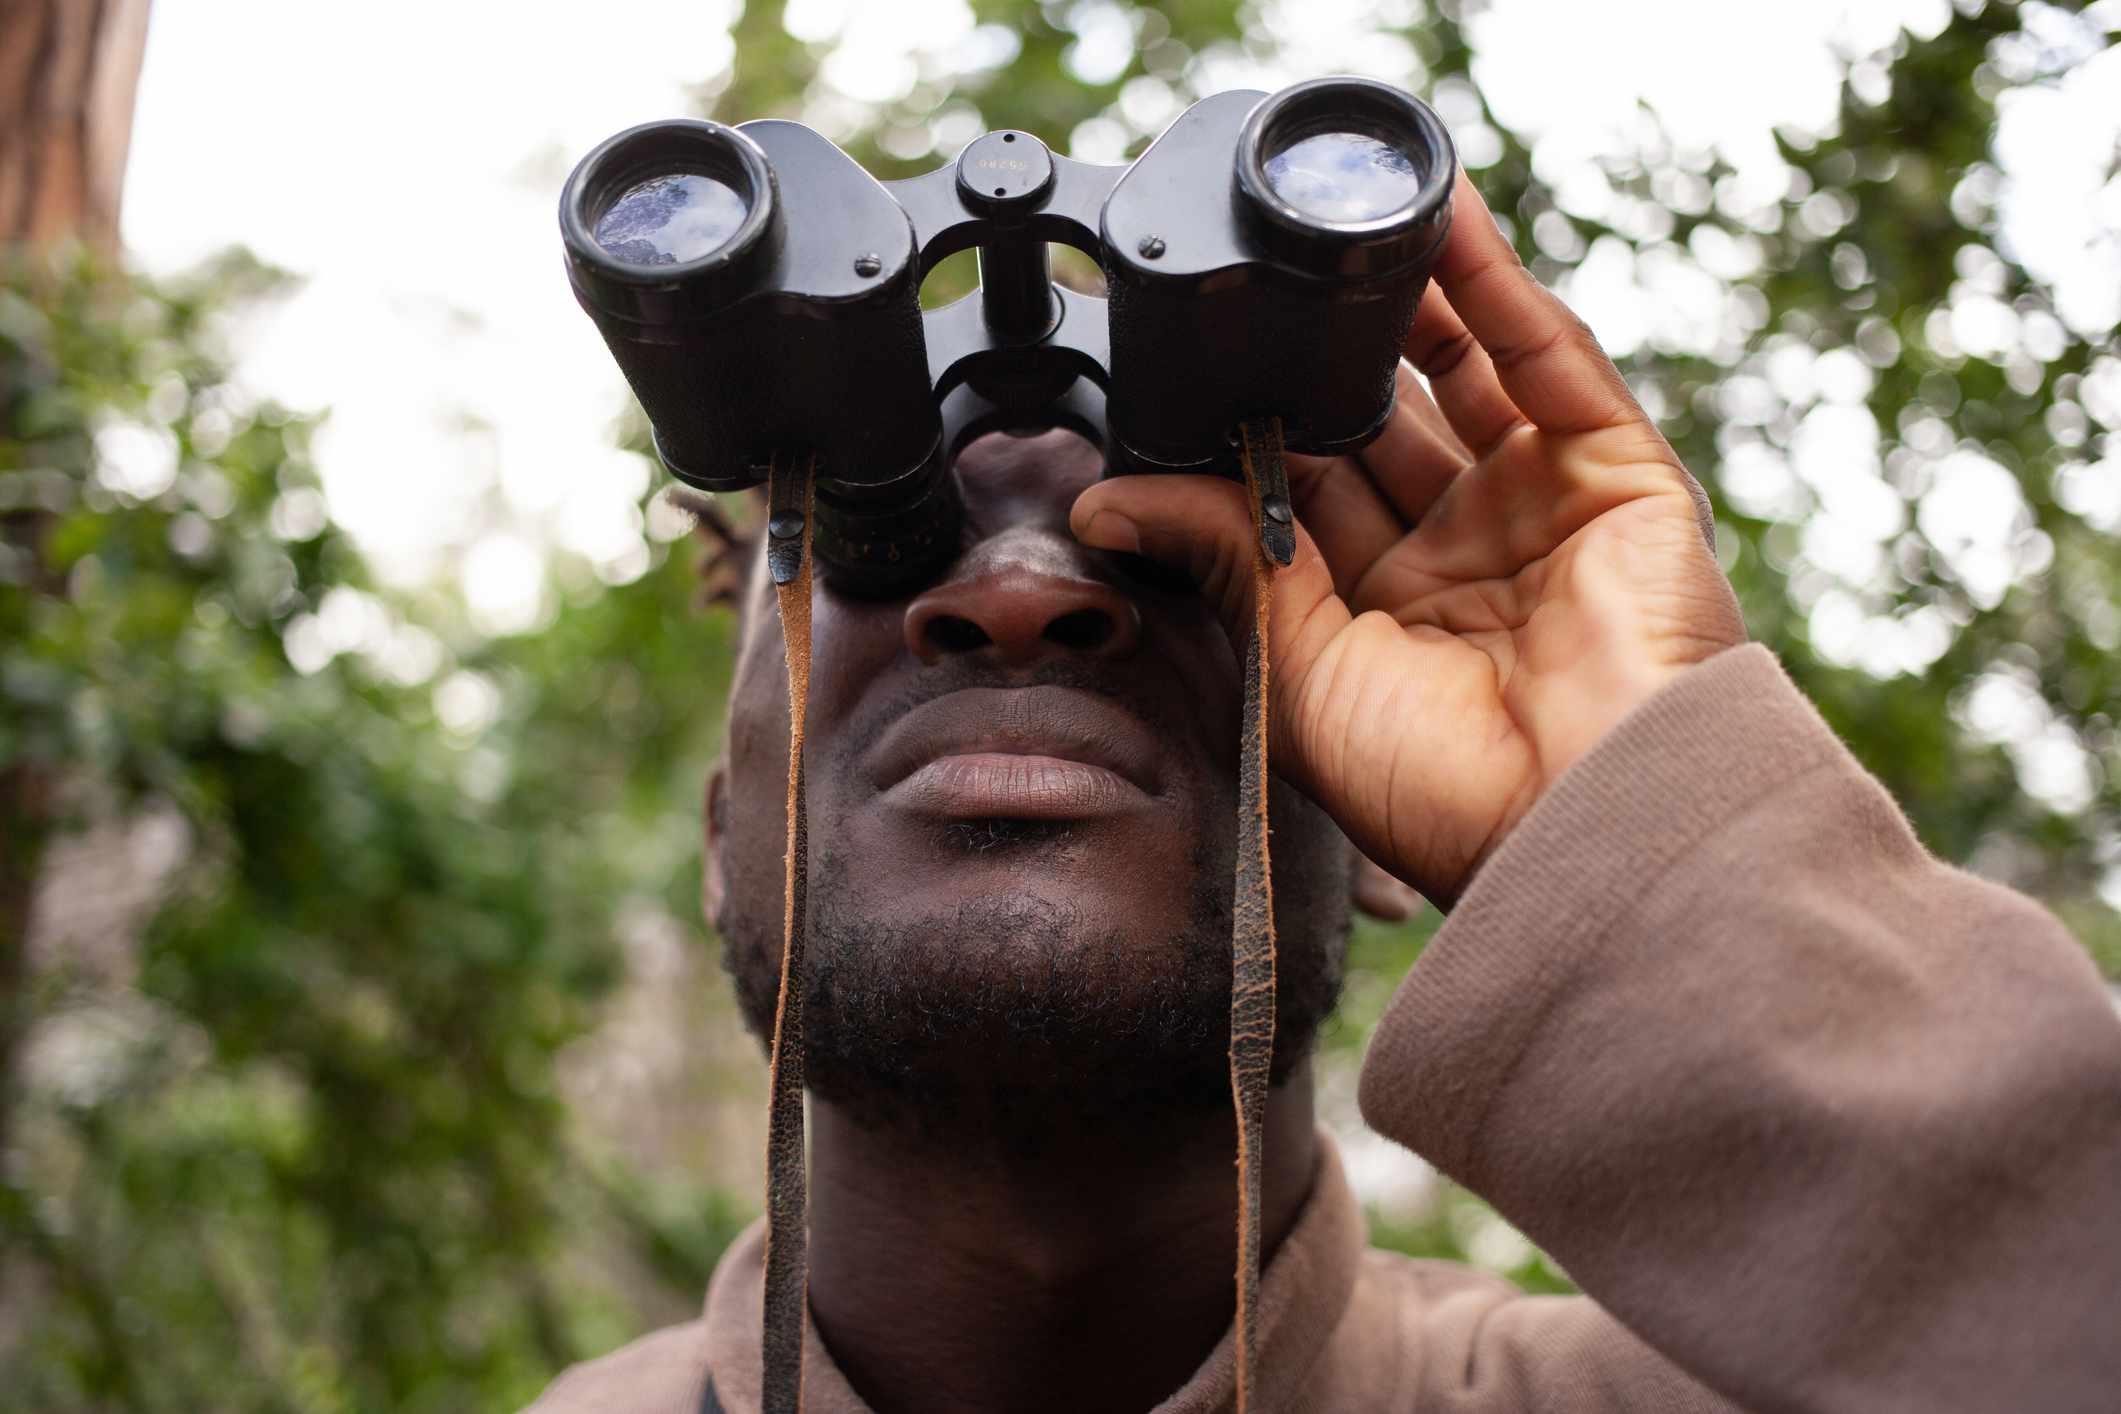 Young man looks through binoculars